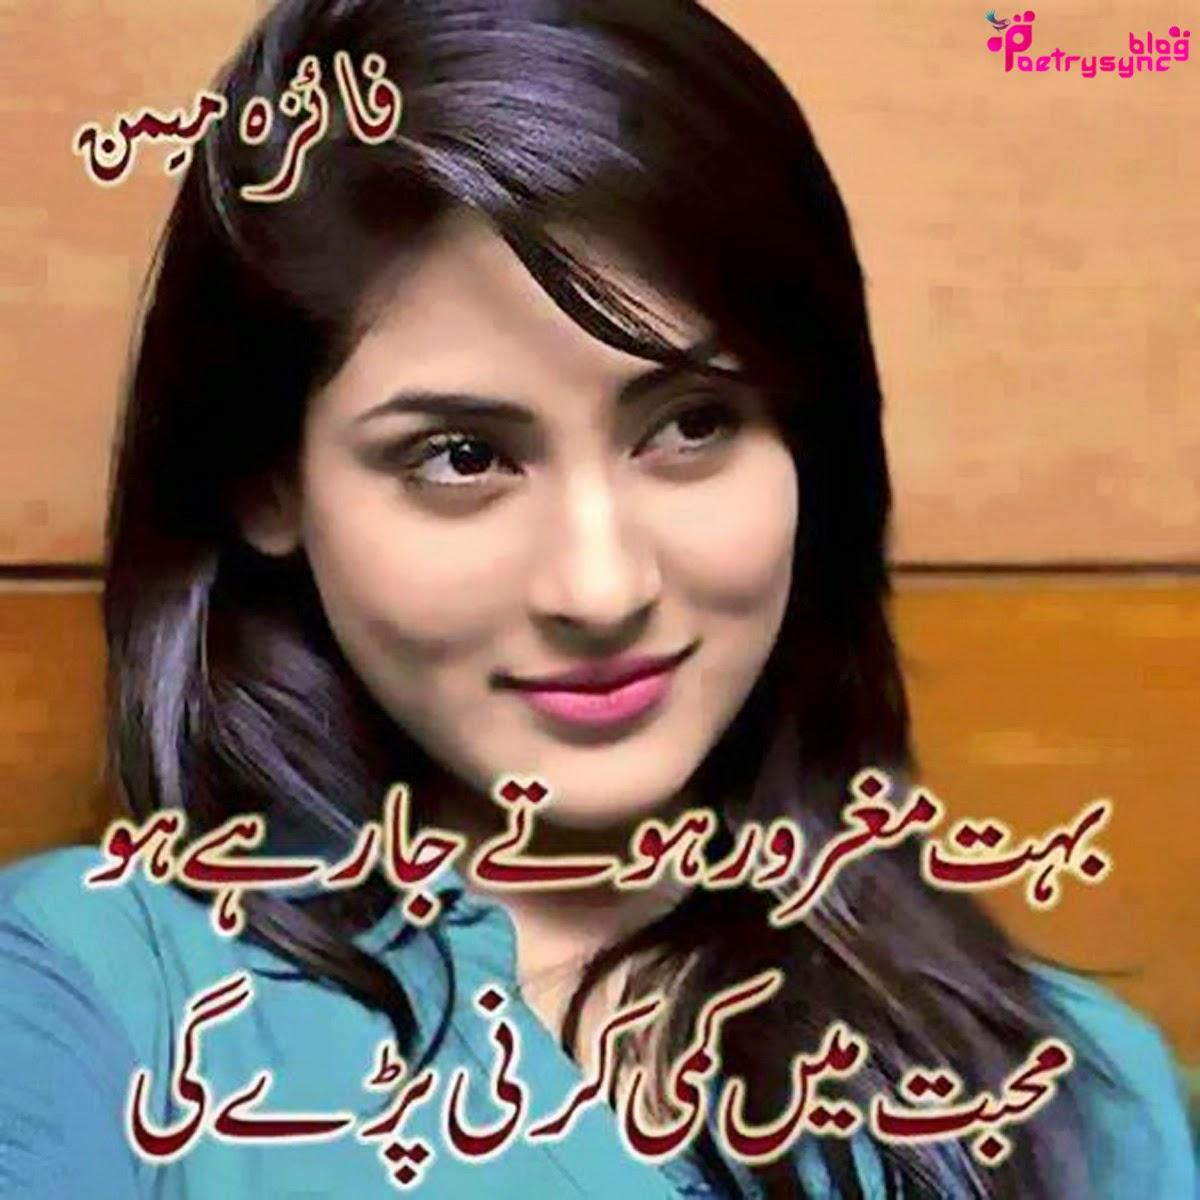 Poetry-Mohabbat-Urdu-Images-Poetry-Shayari-for-Facebook-Timeline-Posts-wallpaper-wp5801197